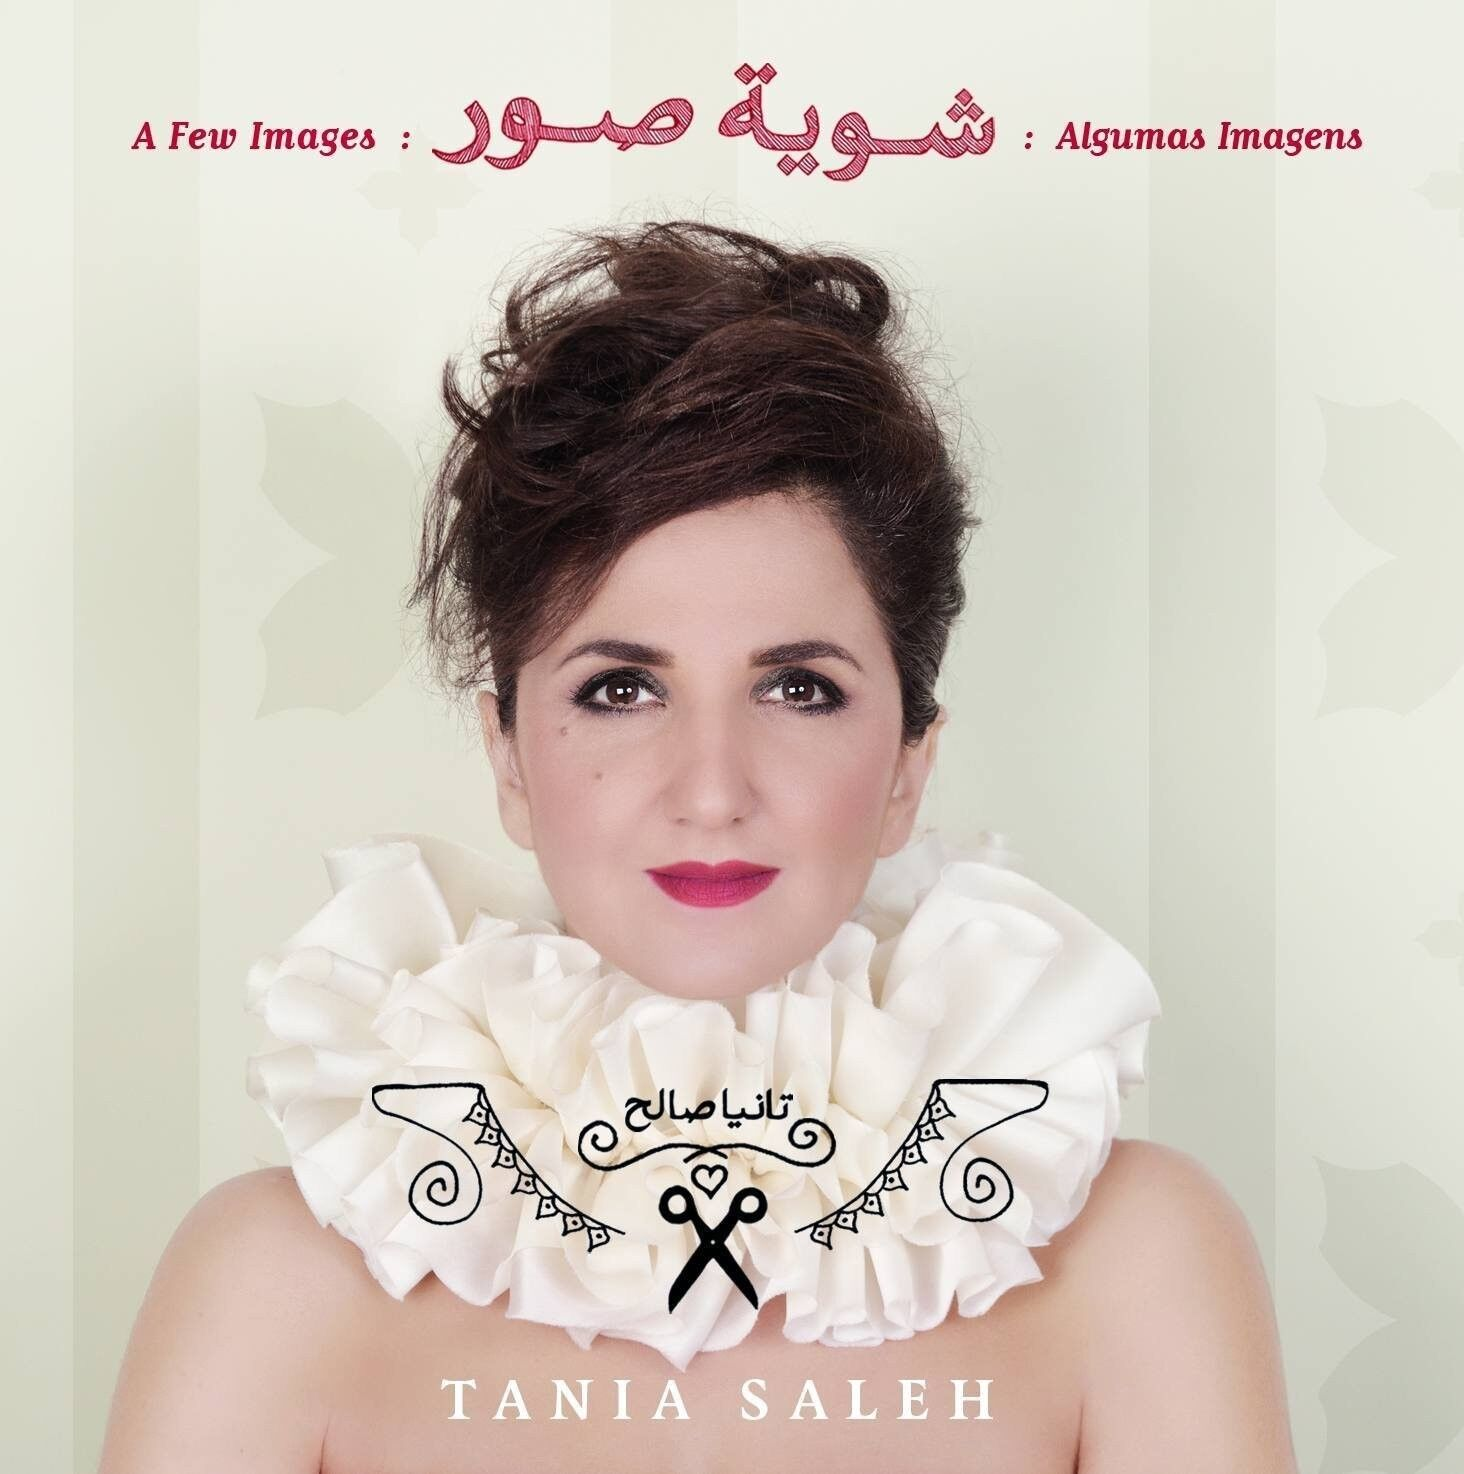 tania saleh im radio-today - Shop